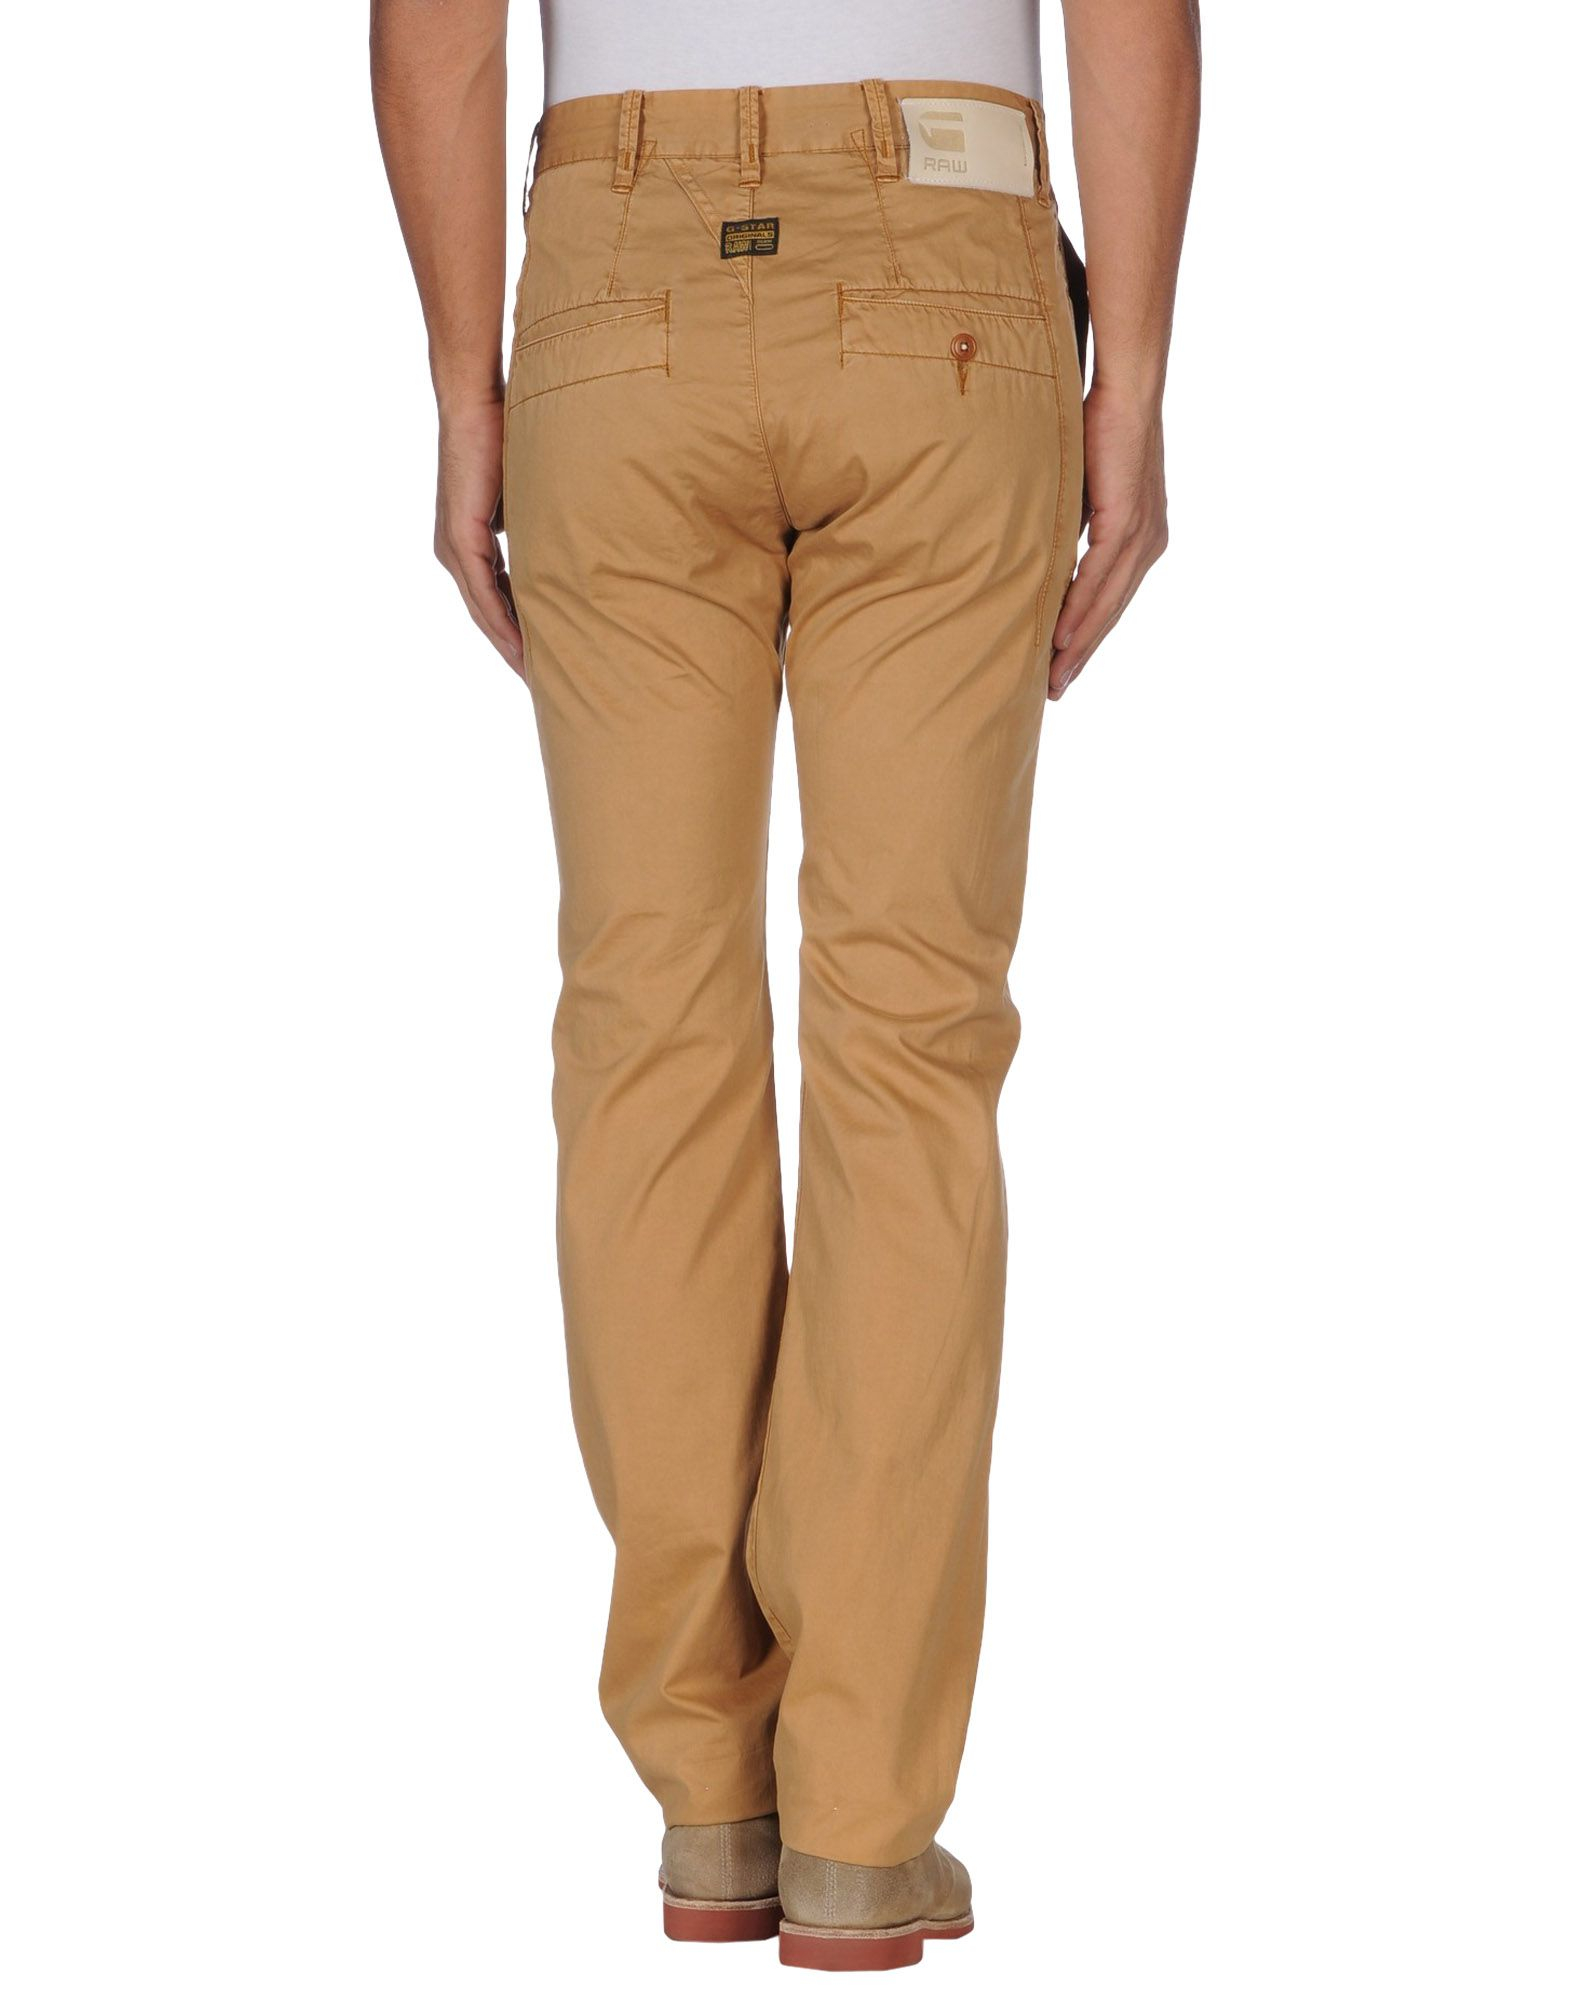 g star raw casual trouser in beige for men camel lyst. Black Bedroom Furniture Sets. Home Design Ideas